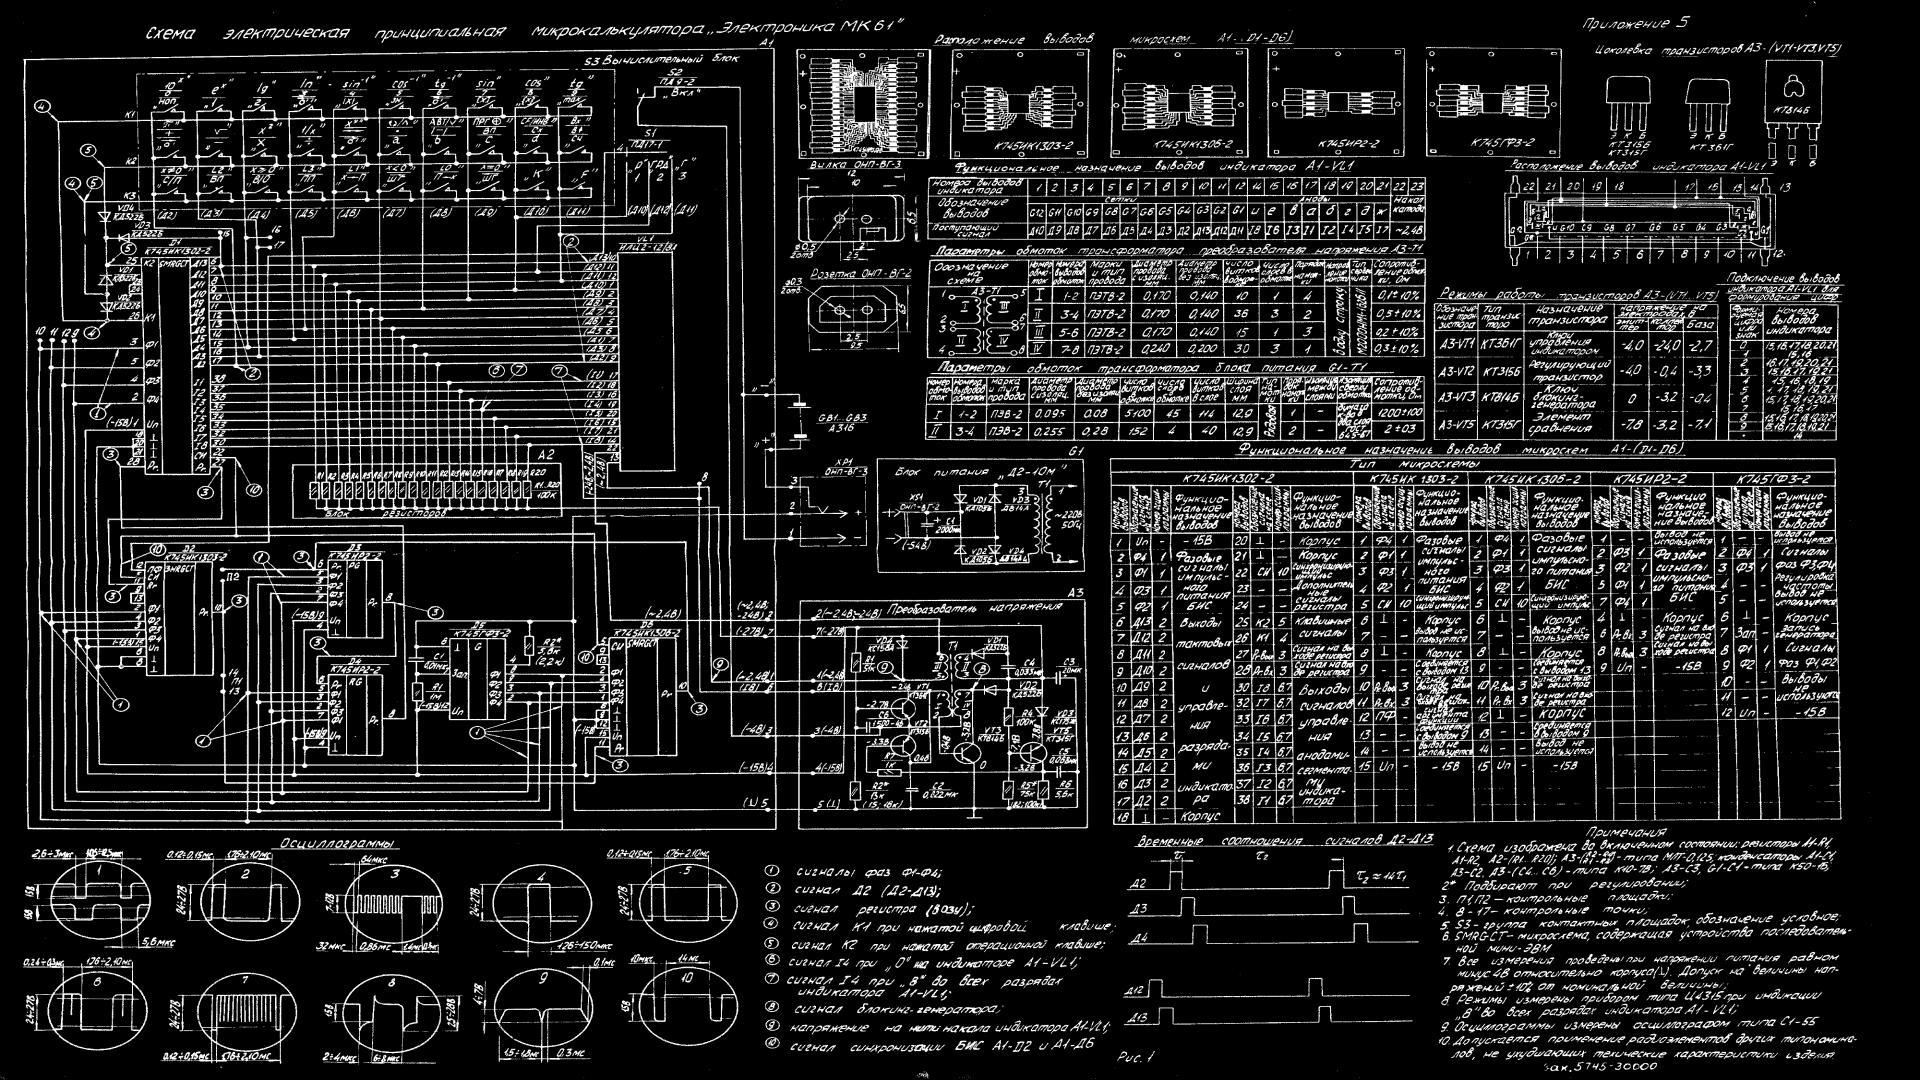 Schematic of a Russian MK 61 calculator Computer Wallpapers Desktop 1920x1080